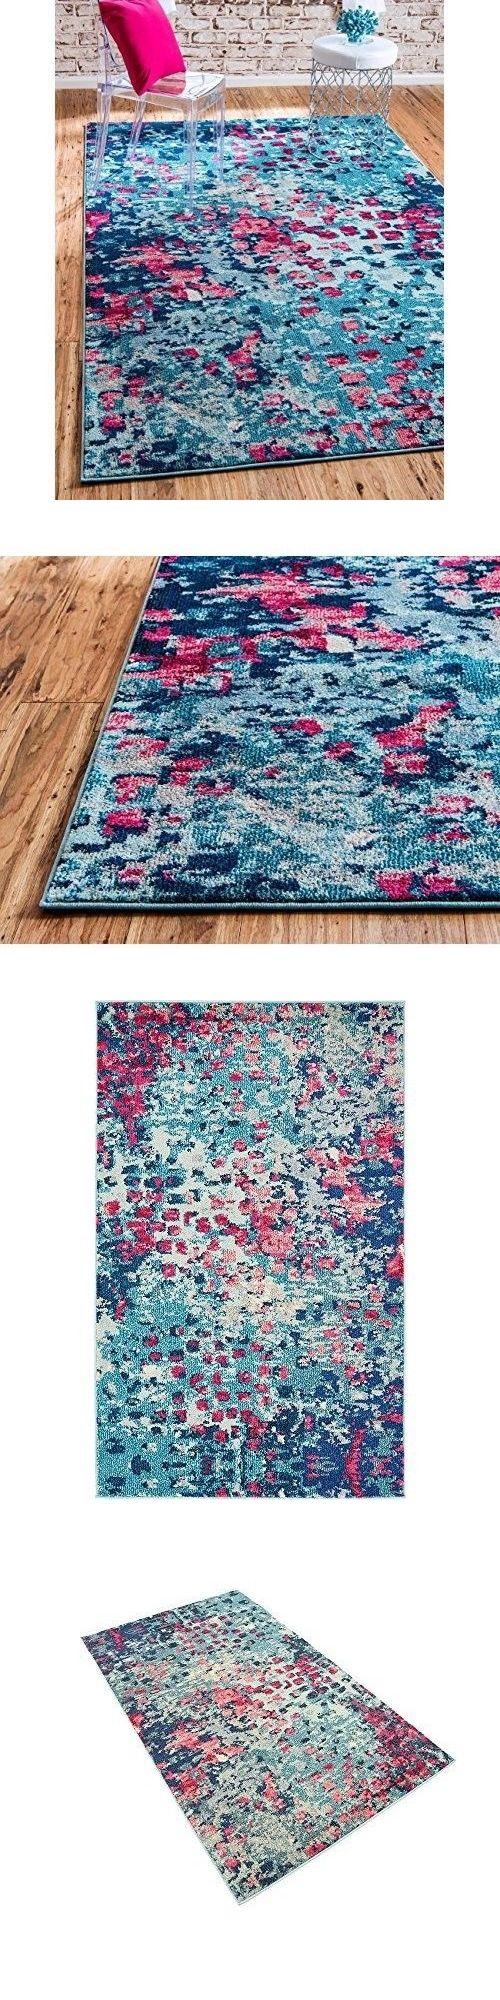 best 25+ blue carpet bedroom ideas on pinterest | blue bedroom